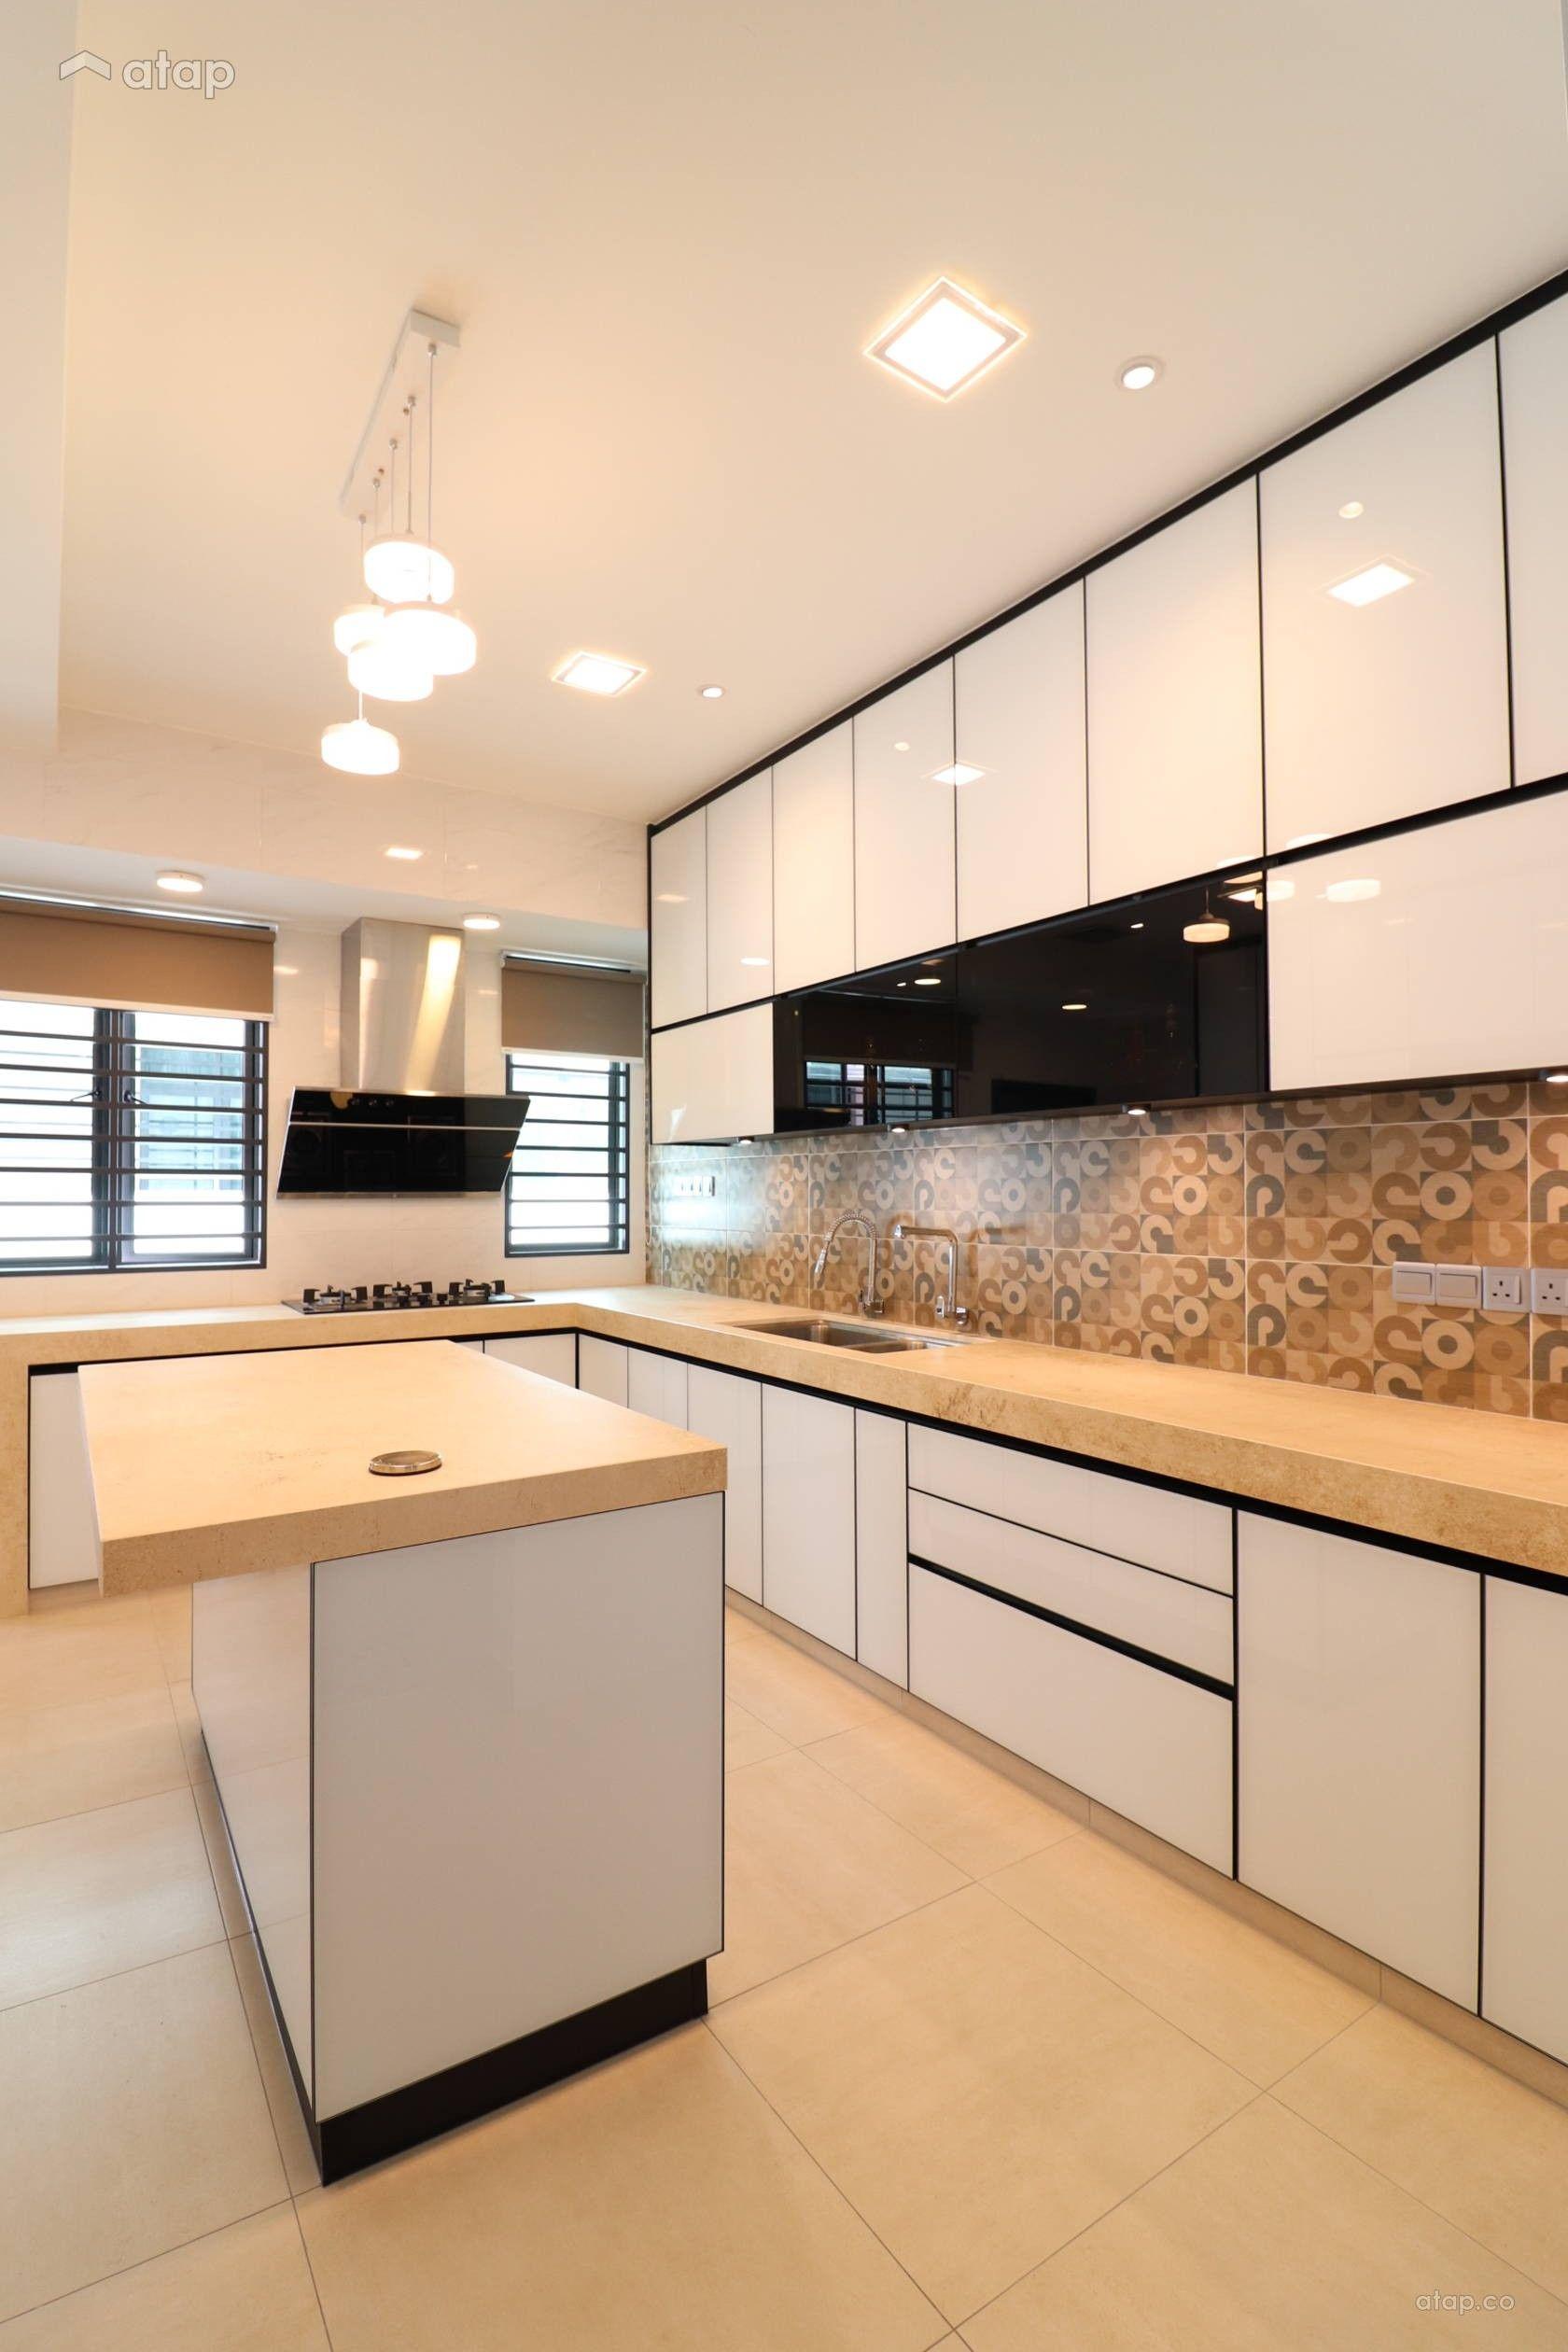 56 awesome modern scandinavian kitchen ideas on awesome modern kitchen design ideas id=73478